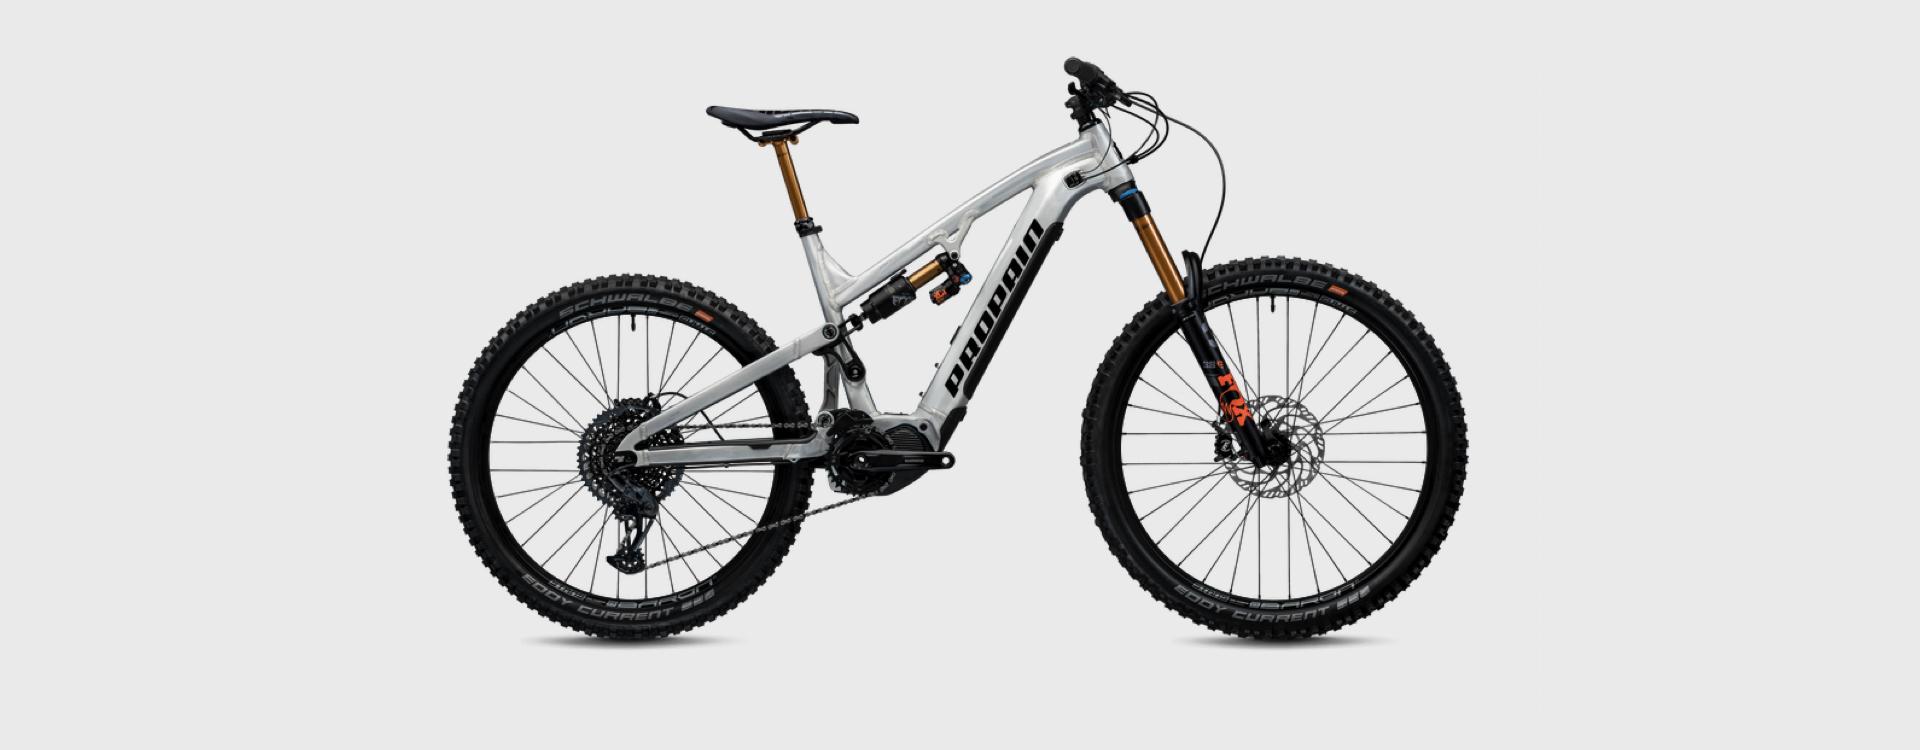 Bike Verleih Gummersbach Propain Bikes Testcenter NRW Ekano 8 - AL - L - 29 - Raw - 1920x750